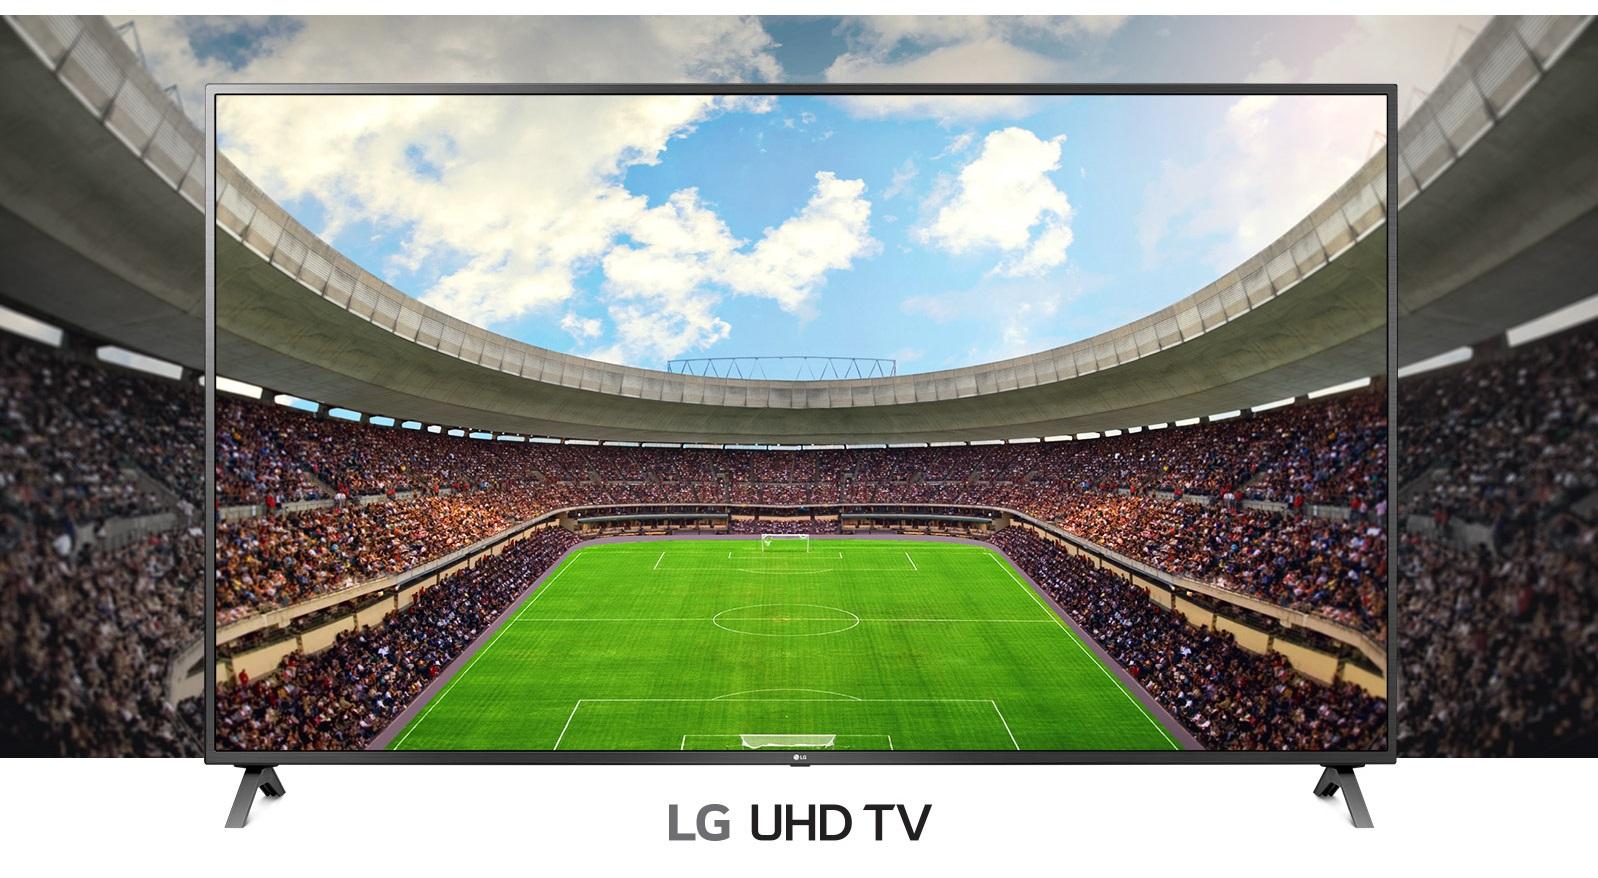 مشخصات تلویزیون 60 اینچ 4K ال جی مدل 60UN7100